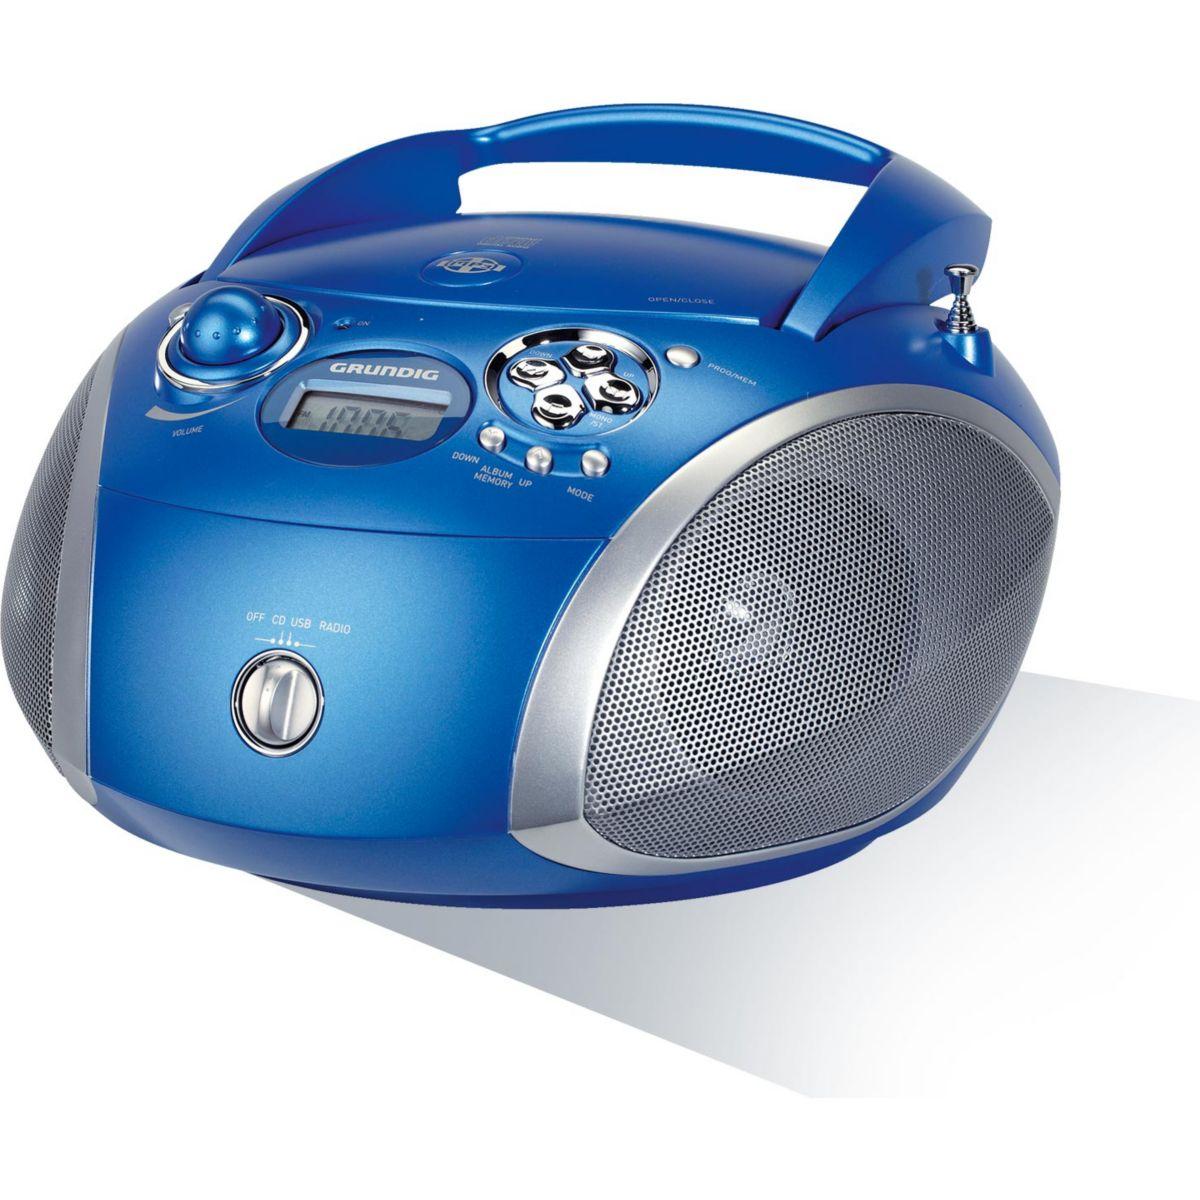 Radio cd grundig rcd1445 bleu - 15% de remise imm�diate avec le code : fete15 (photo)